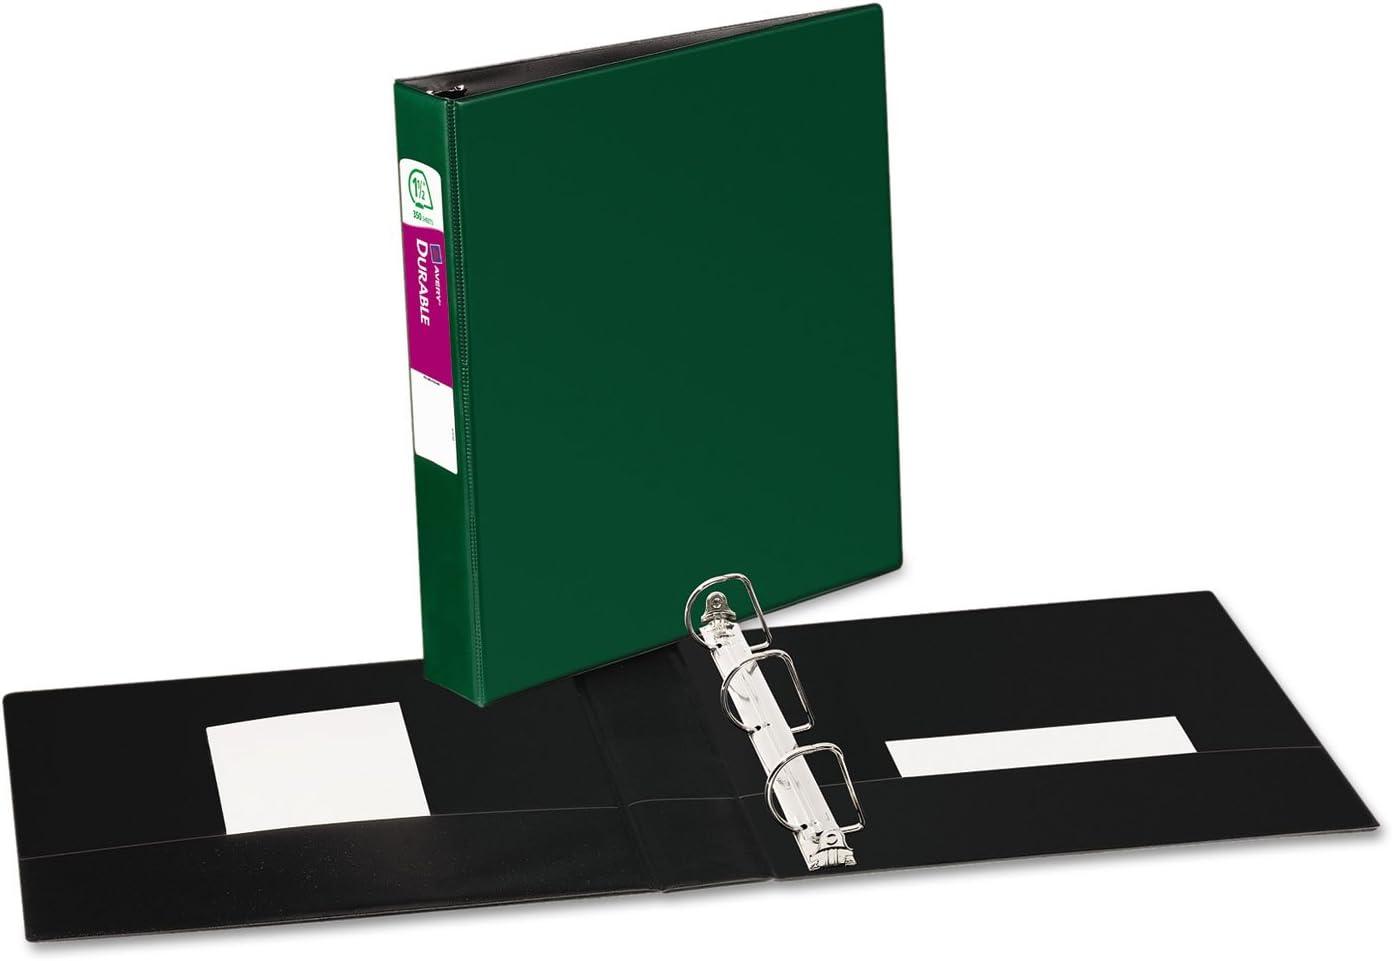 Green Avery 27353 Durable Binder 8-1//2 x 11 1.5-Inch Capacity Slant Rings 1//EA